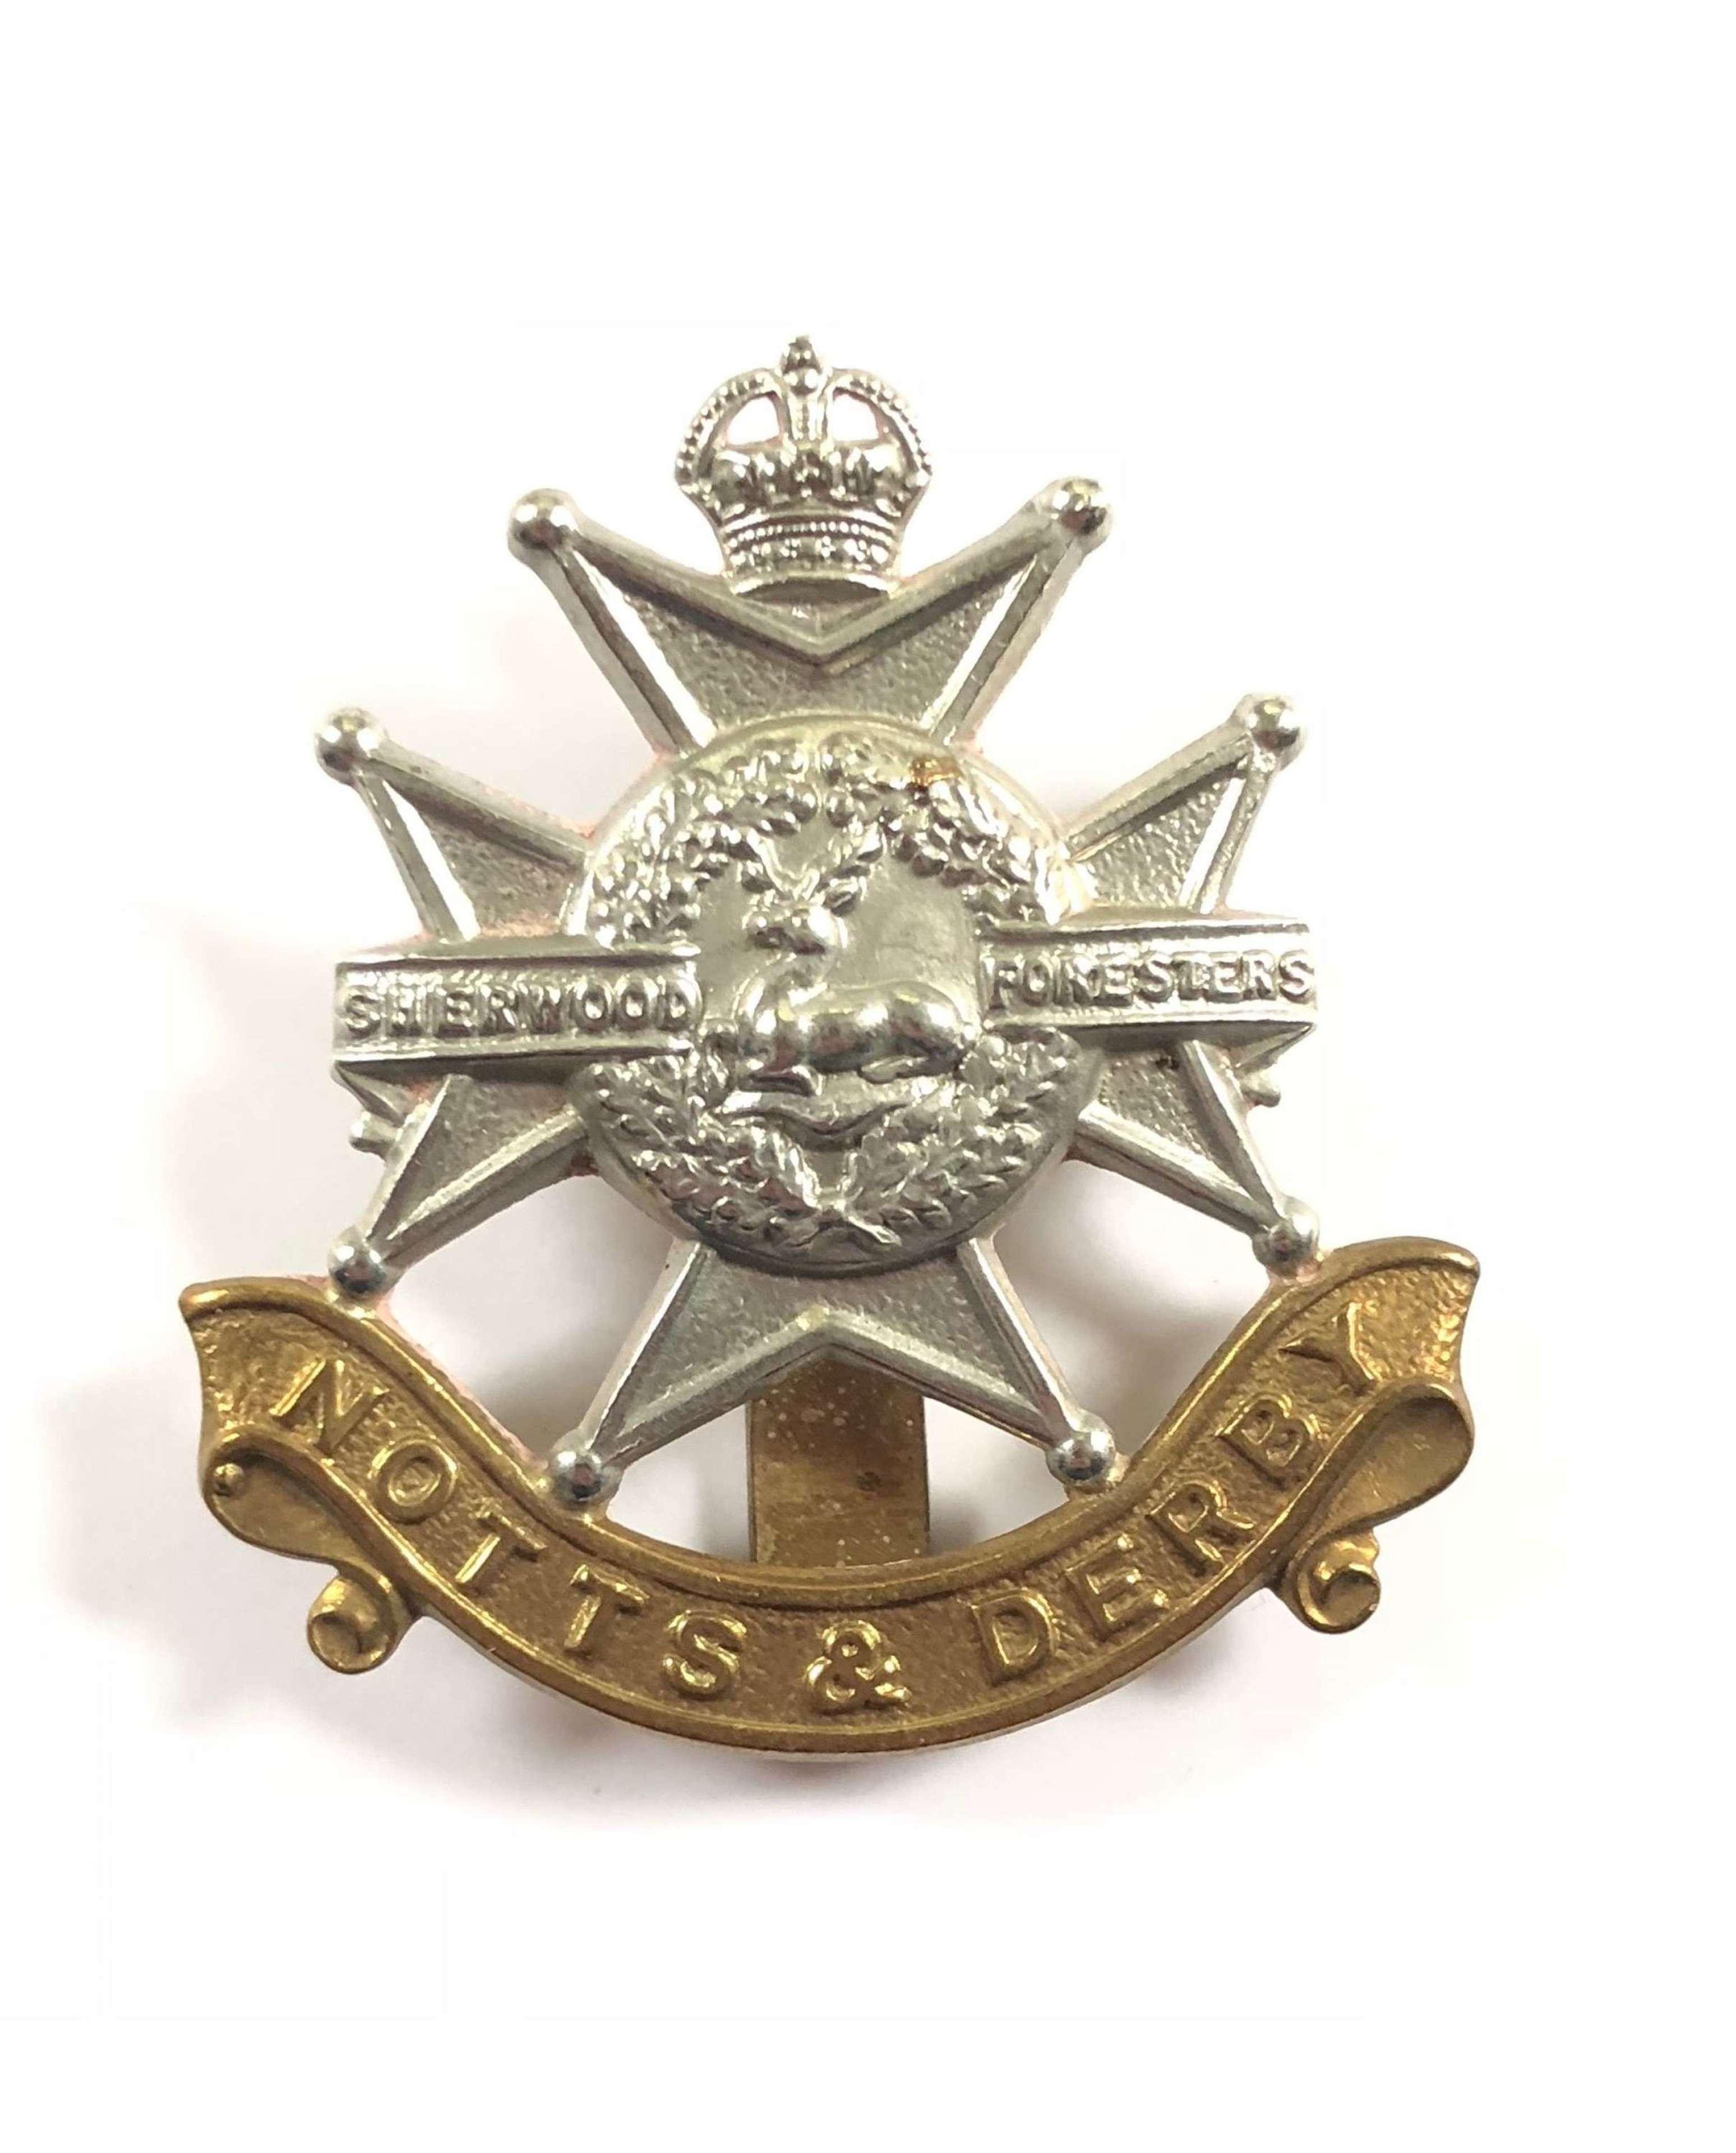 WW1 / WW2 Notts & Derby Cap badge.